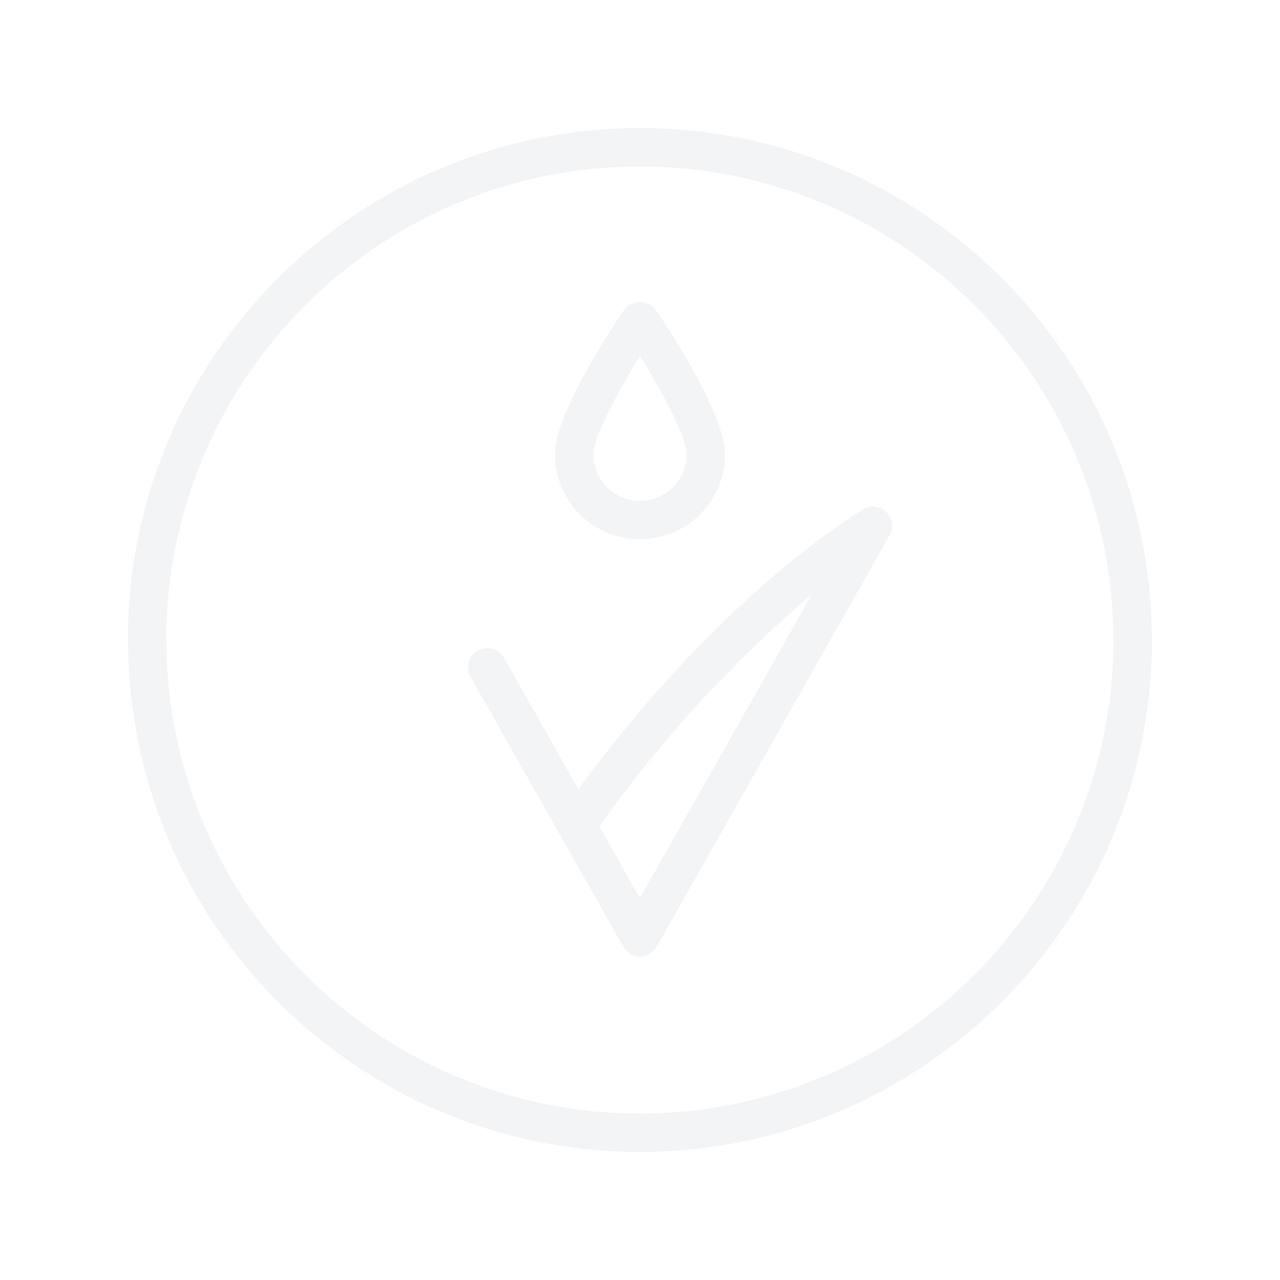 BIOTHERM Skin Oxygen Lotion 200ml